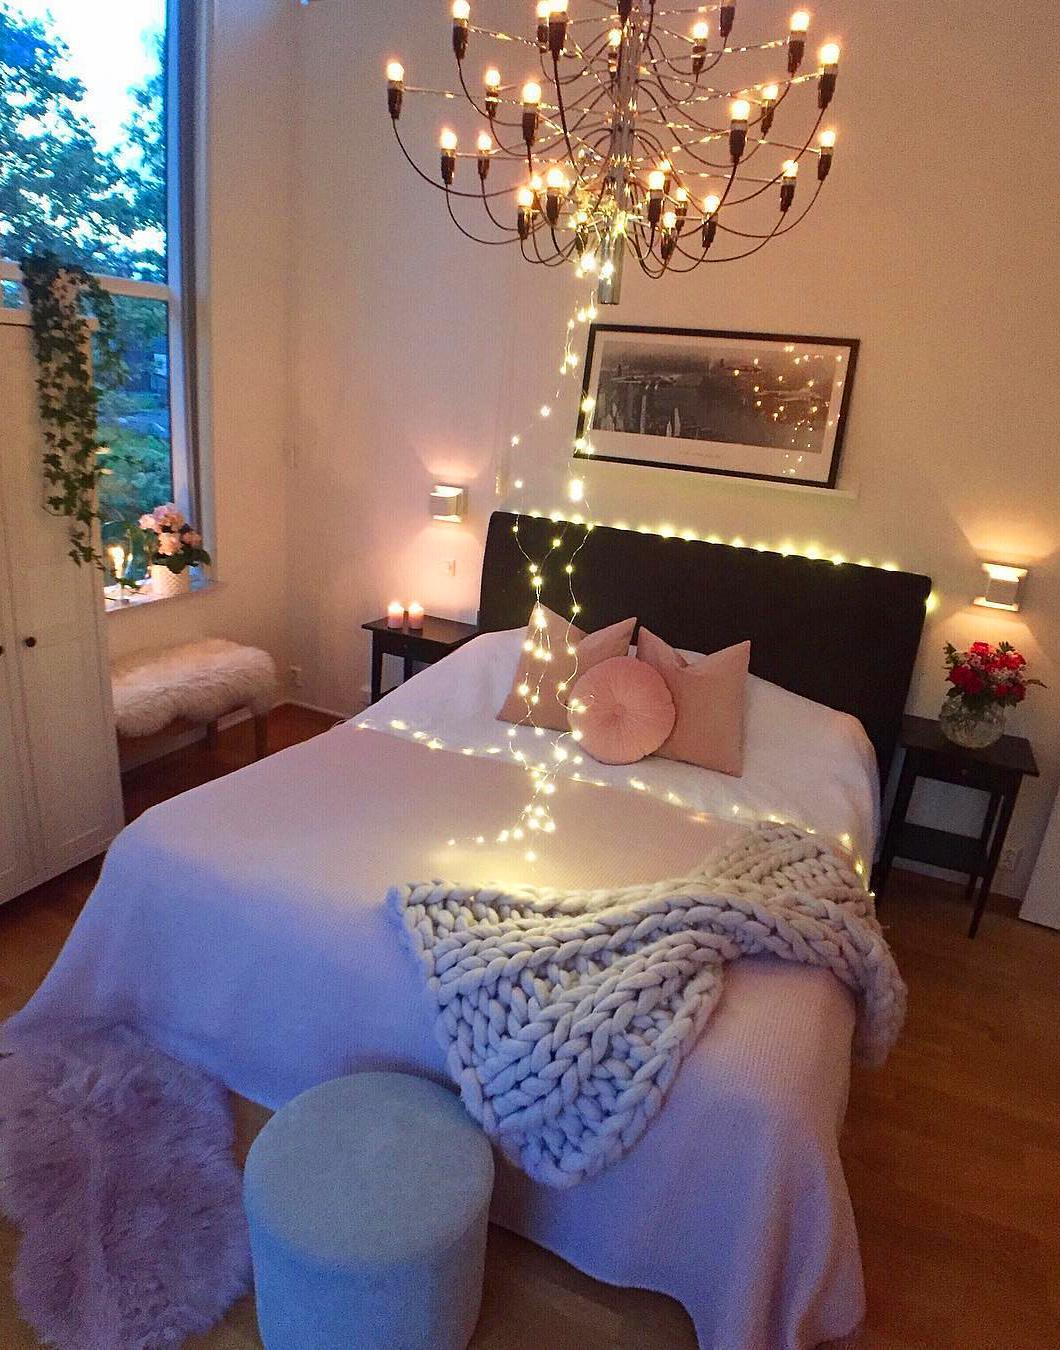 60 Creative Master Bedroom Design Ideas